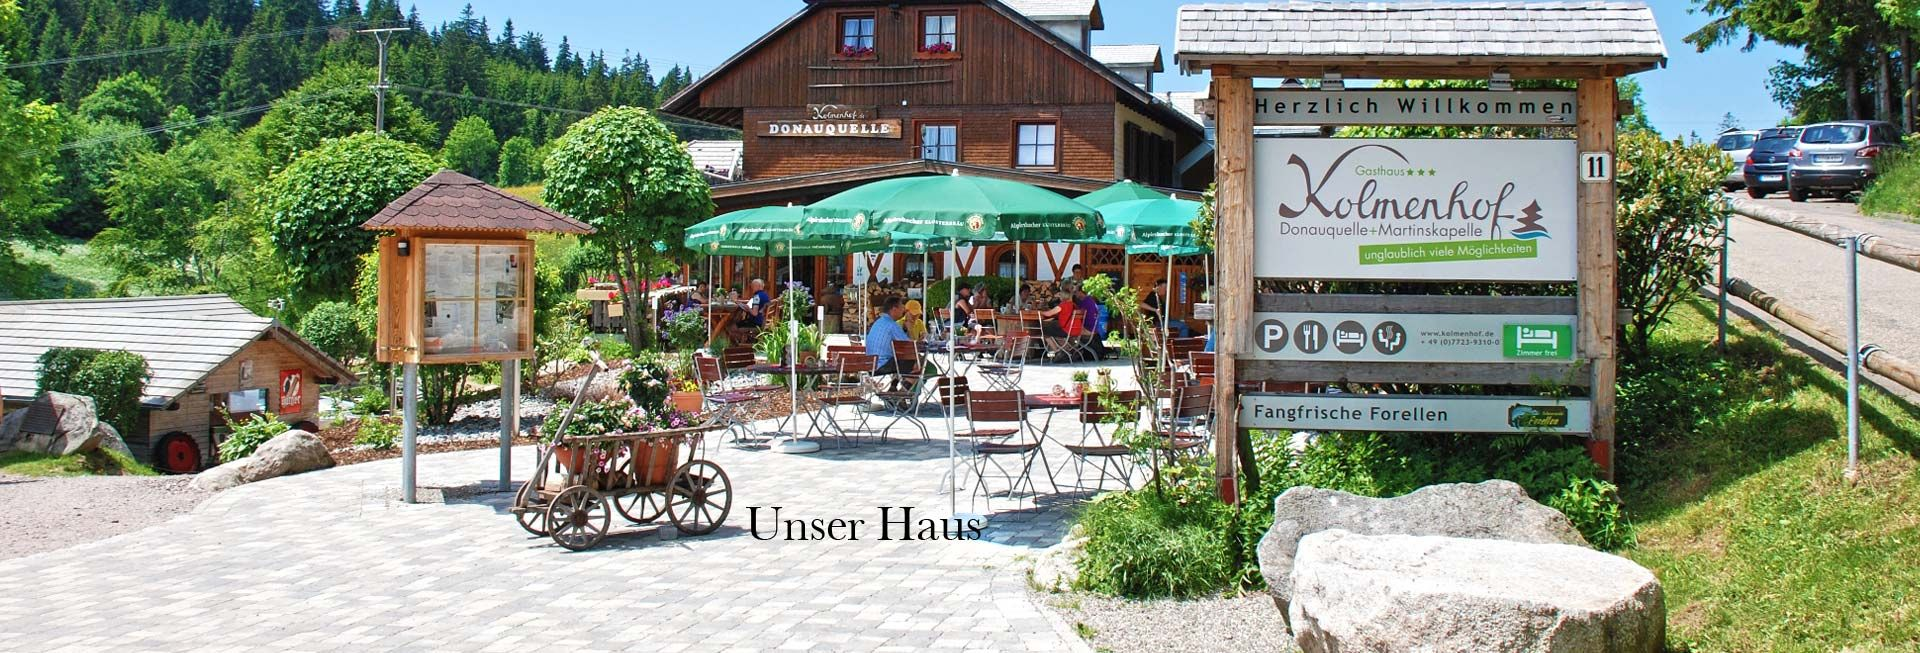 Kolmenhof Themenhead Unser Haus 11112015